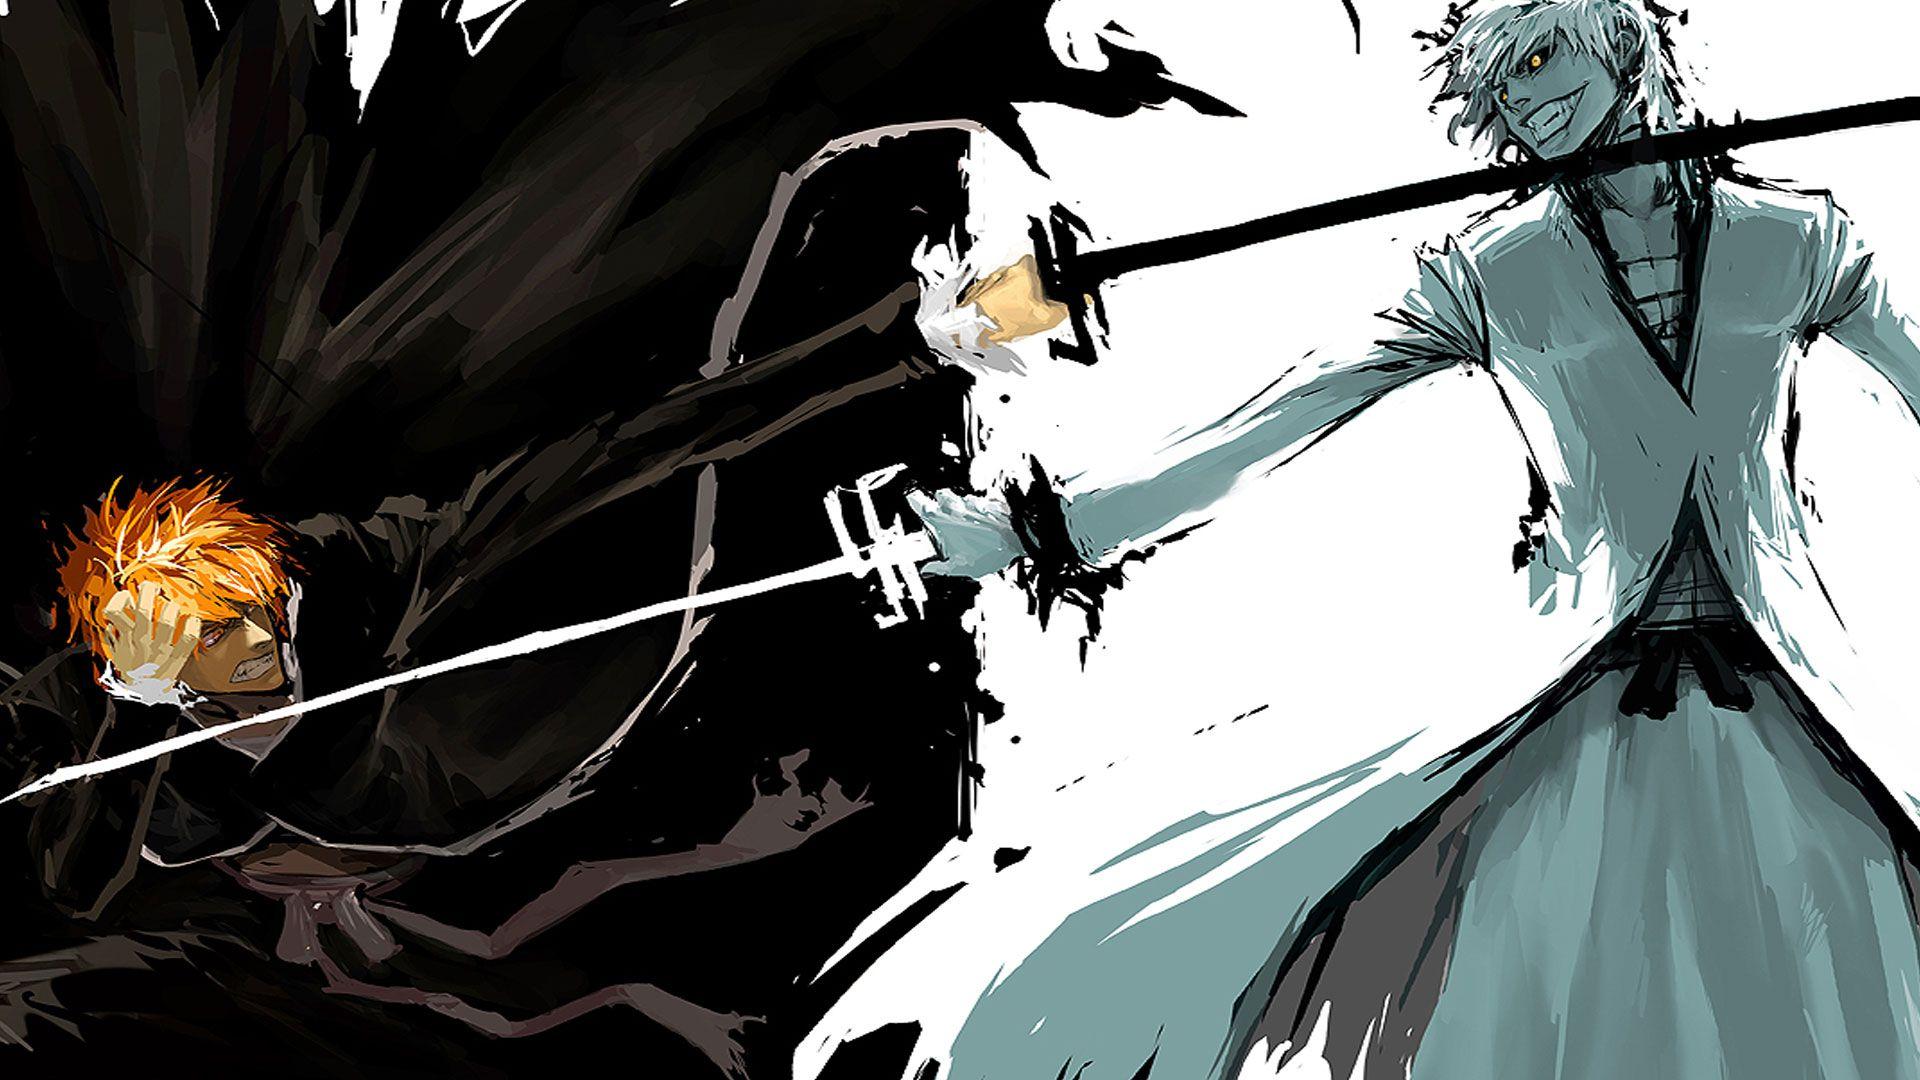 Wallpaper Kurosaki Bleach Ichig Papers Ichigo Hollow Anime Cool